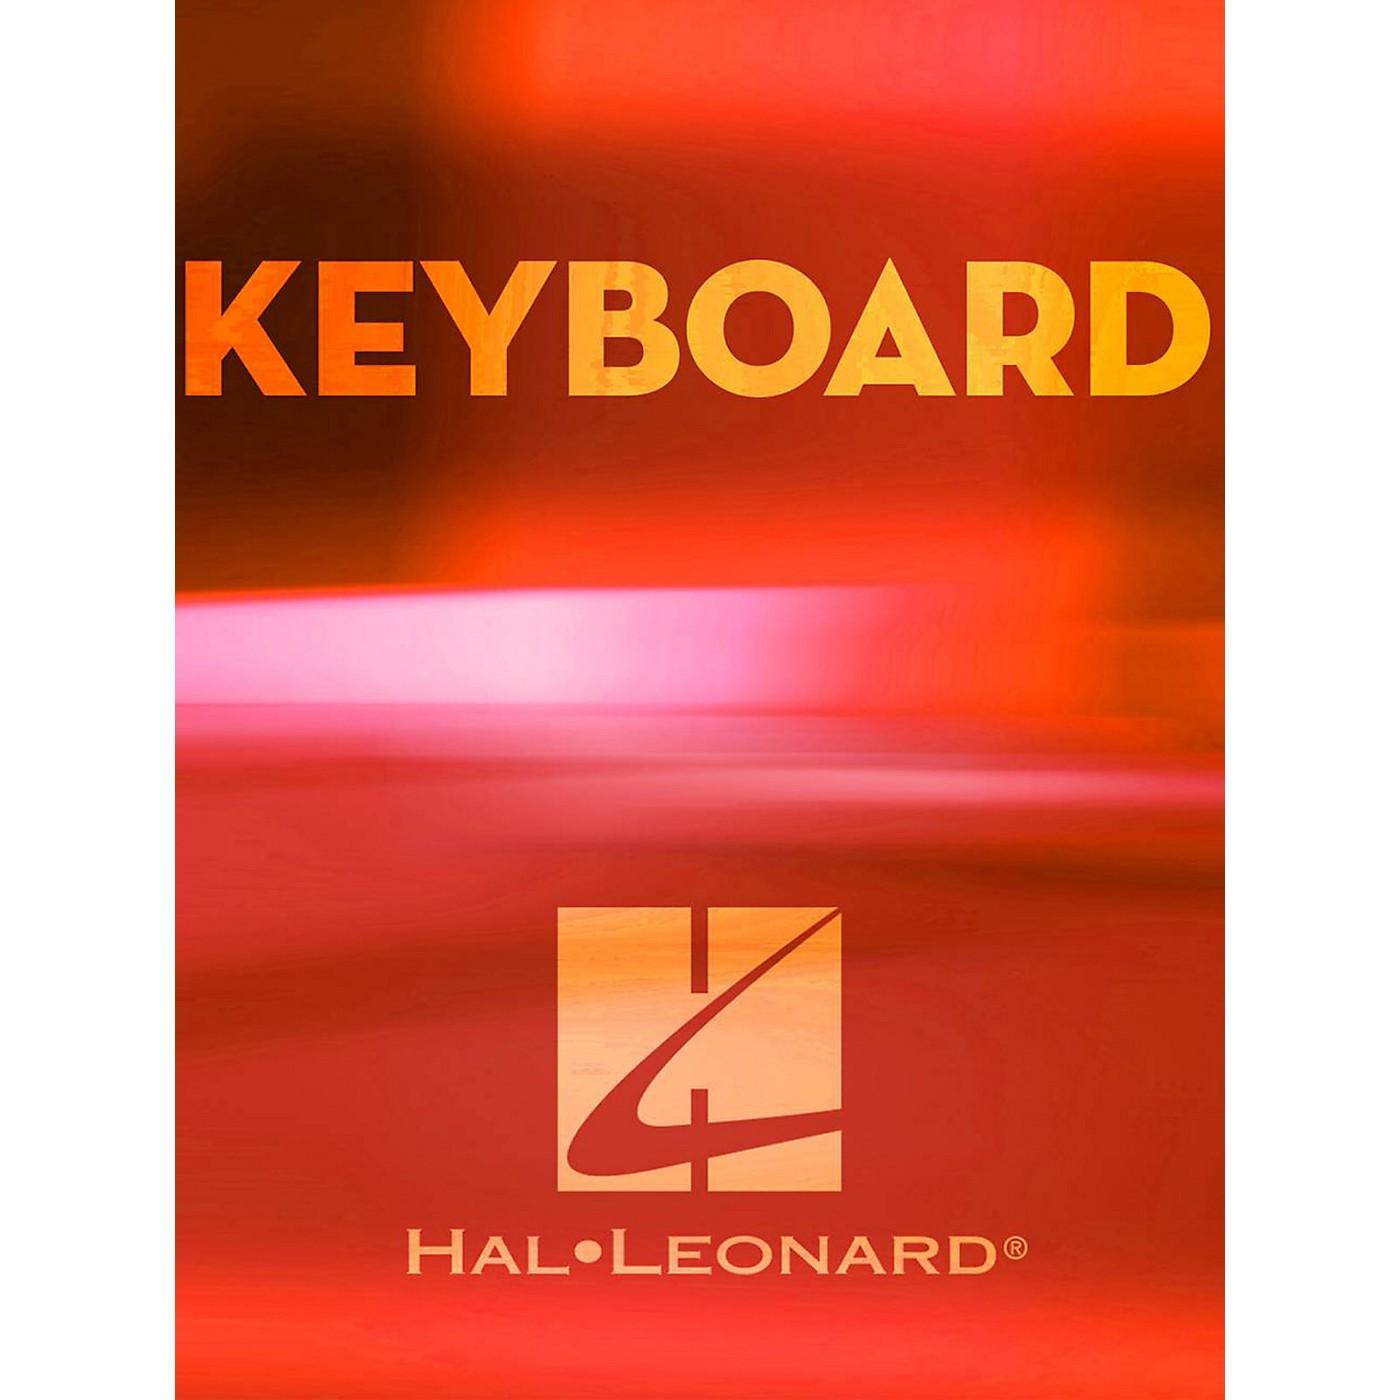 Hal Leonard More Hymns For Praise & Worship Pdf Files Cd-rom Bass Clarinet Sacred Folio Series CD-ROM thumbnail